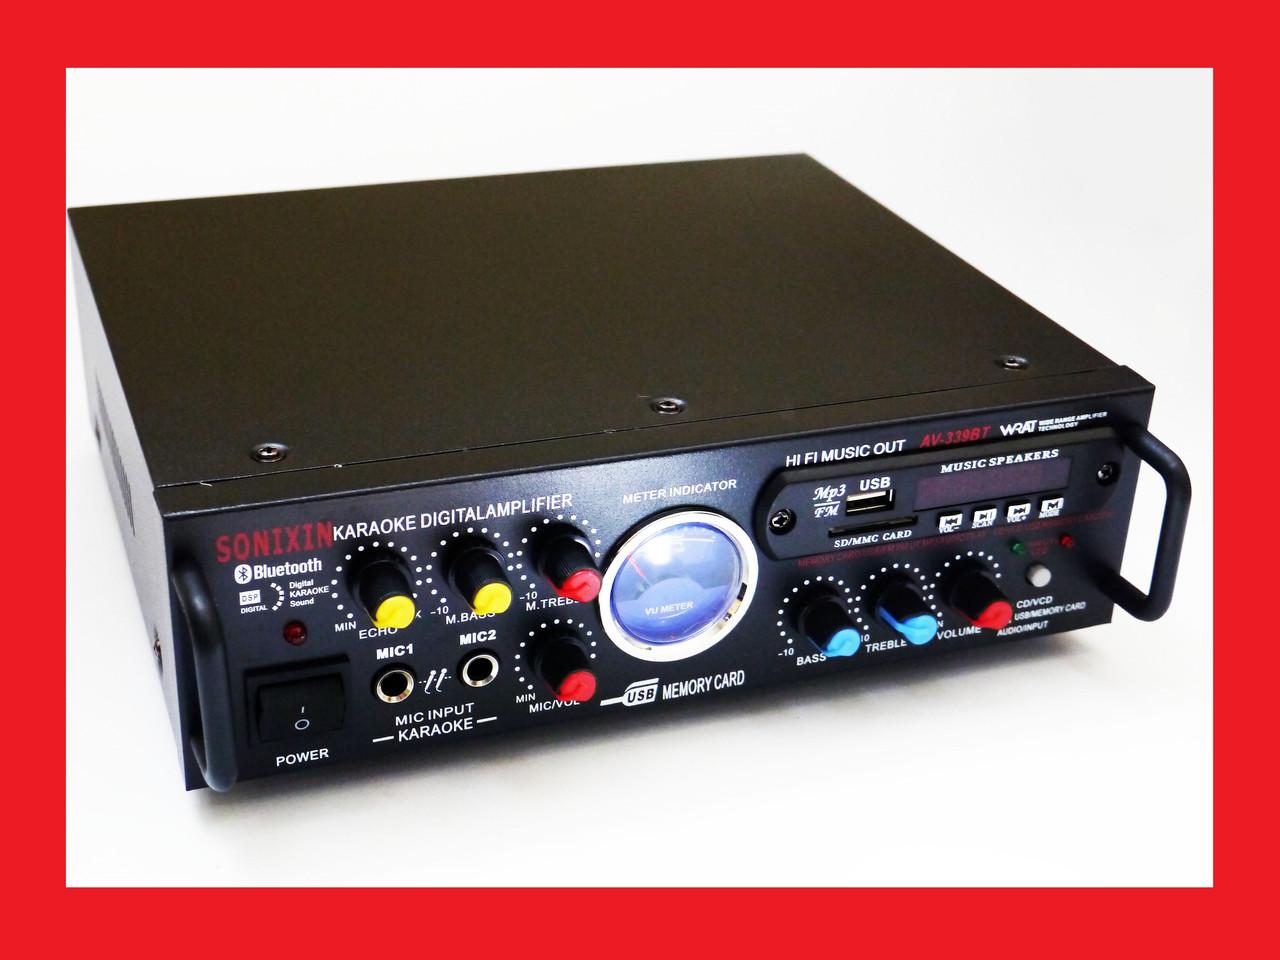 Підсилювач звуку Sonixin AV-339BT + USB + Fm + Mp3 + КАРАОКЕ + Bluetooth